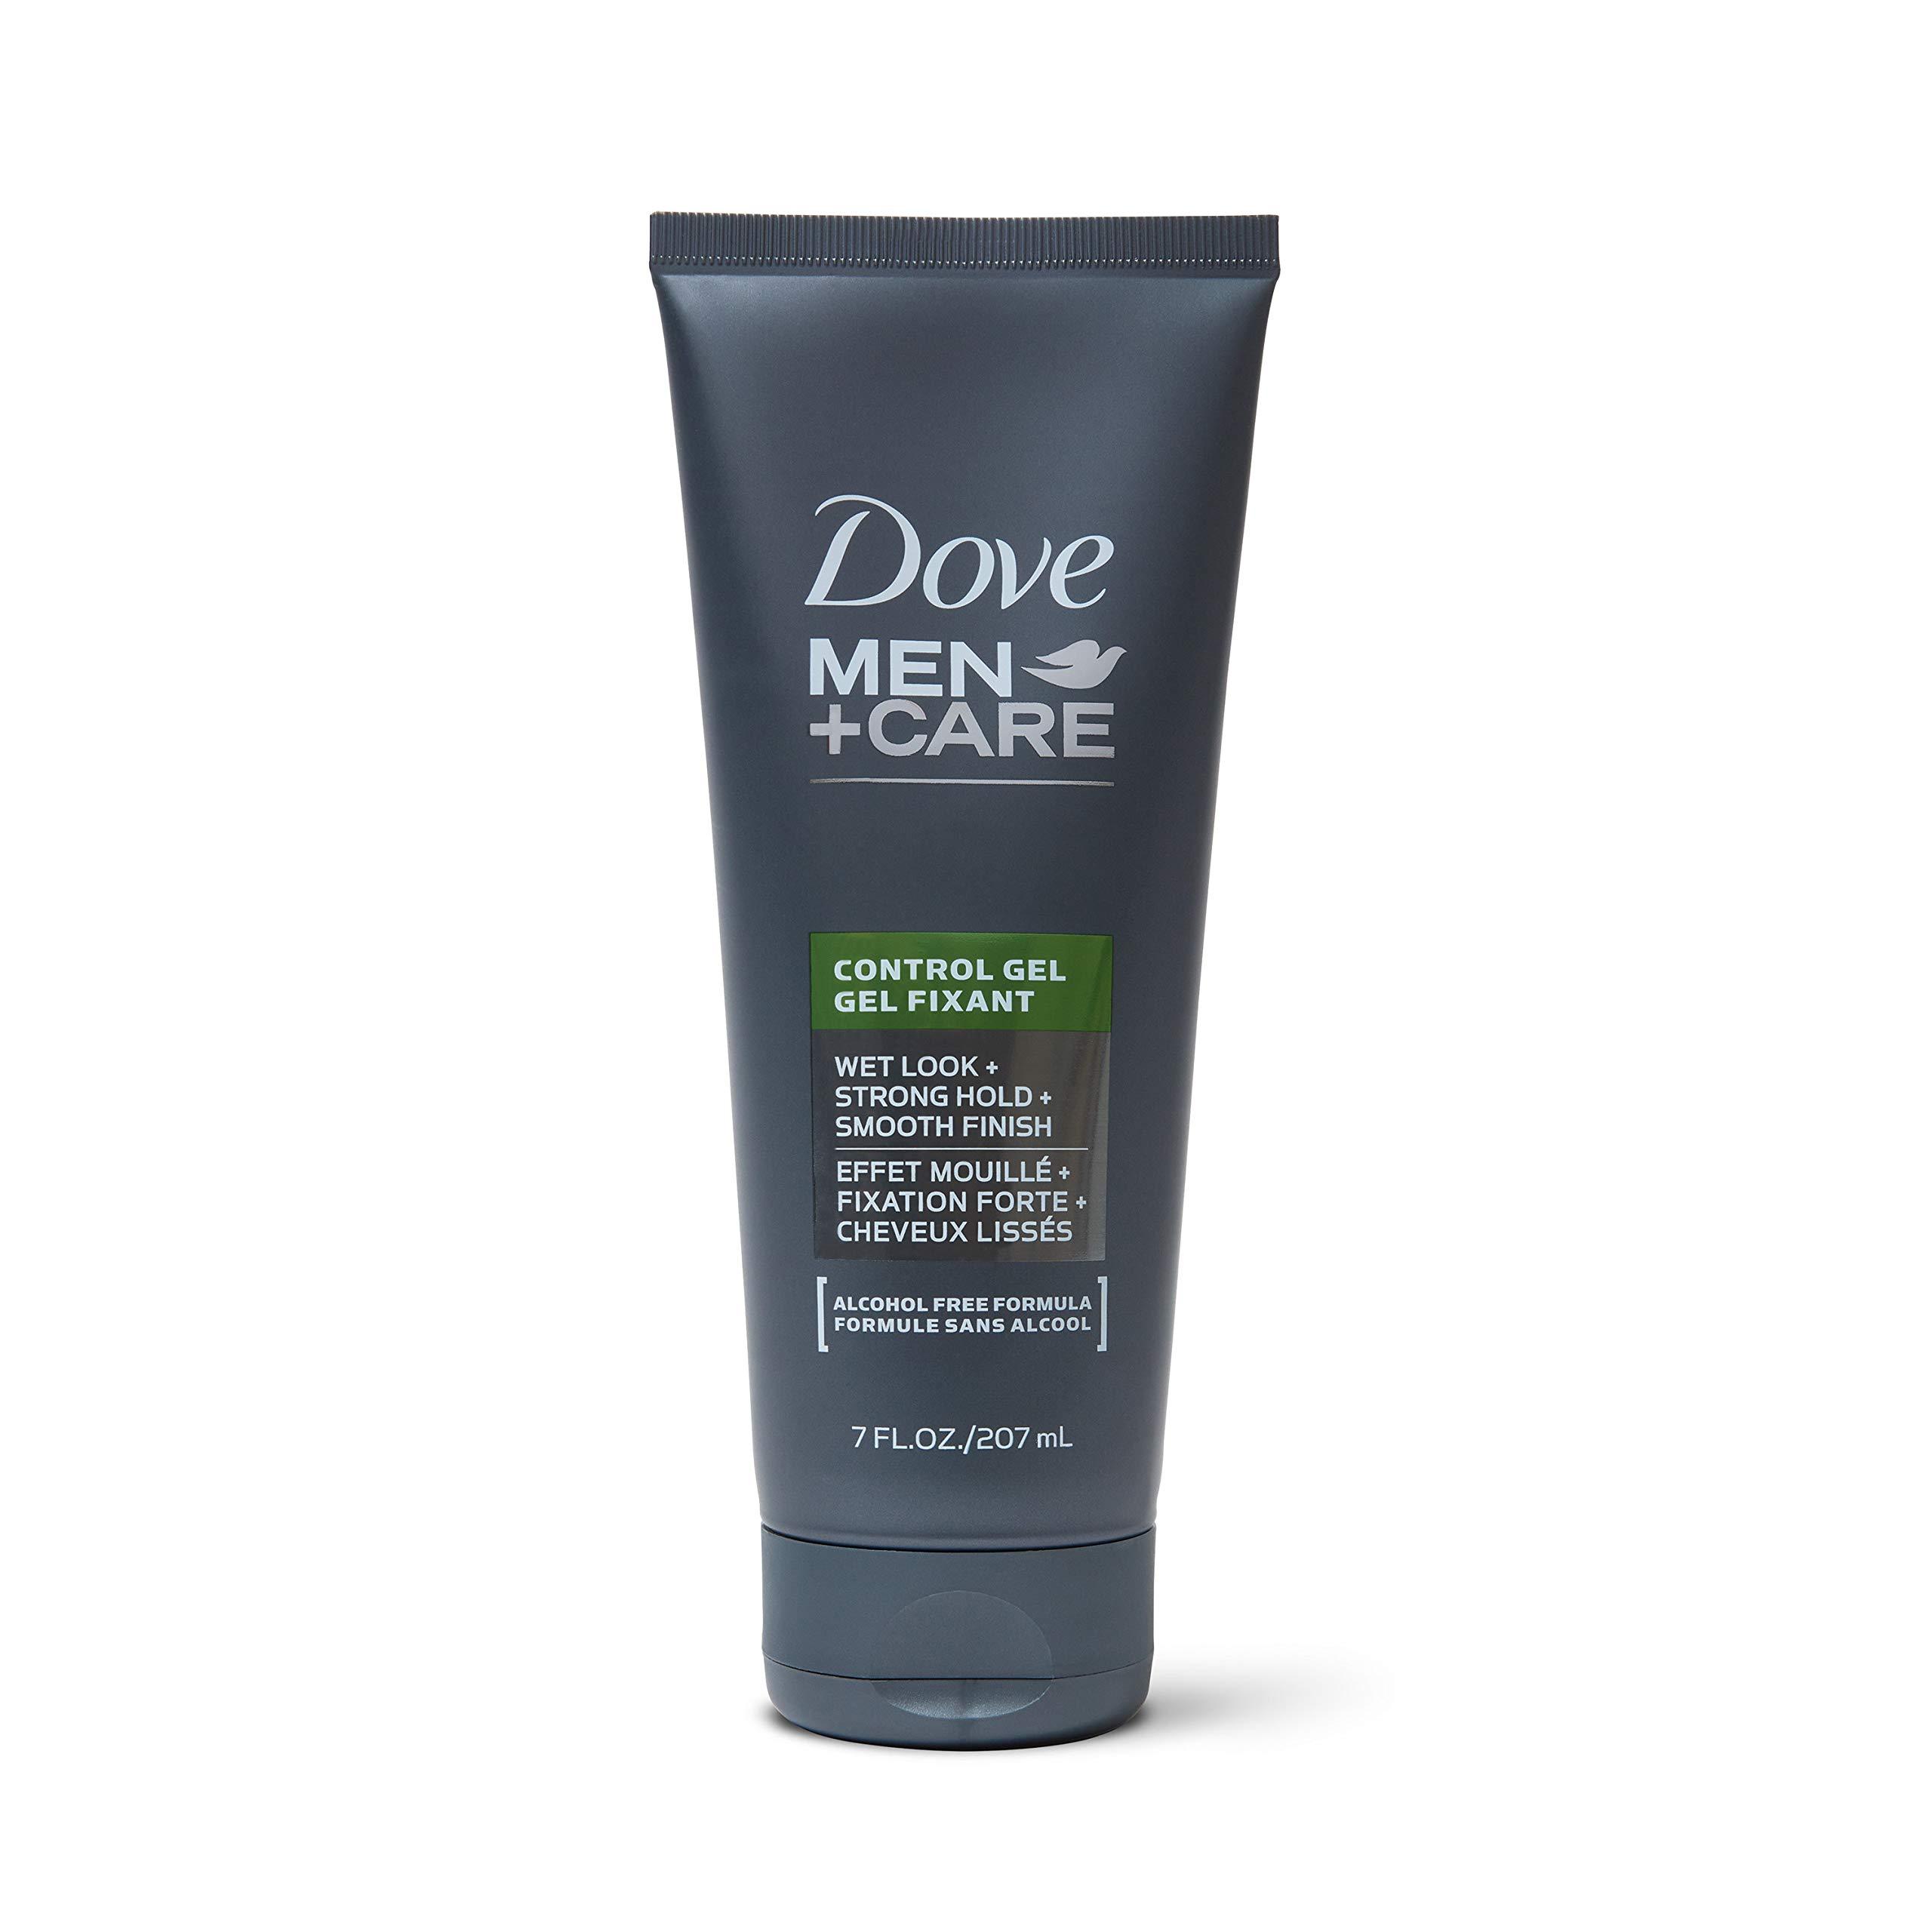 Dove Men+Care Hair Styling Control Gel 7 oz